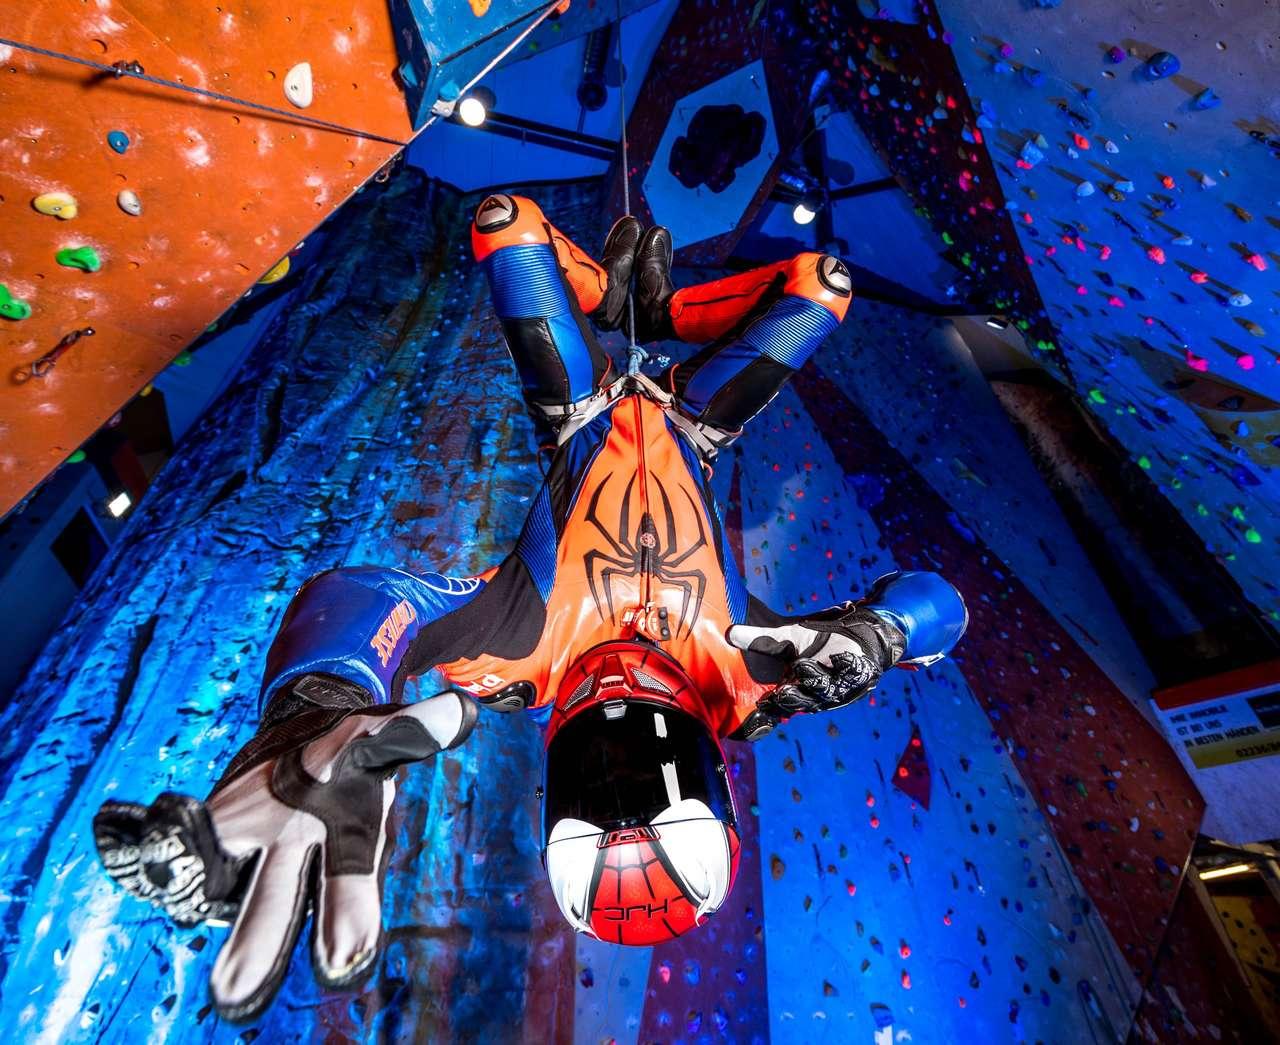 Maßgeschneiderte Spiderman-Lederkombi, made by Dainese Custom Works. Fotos: Kurt Pinter